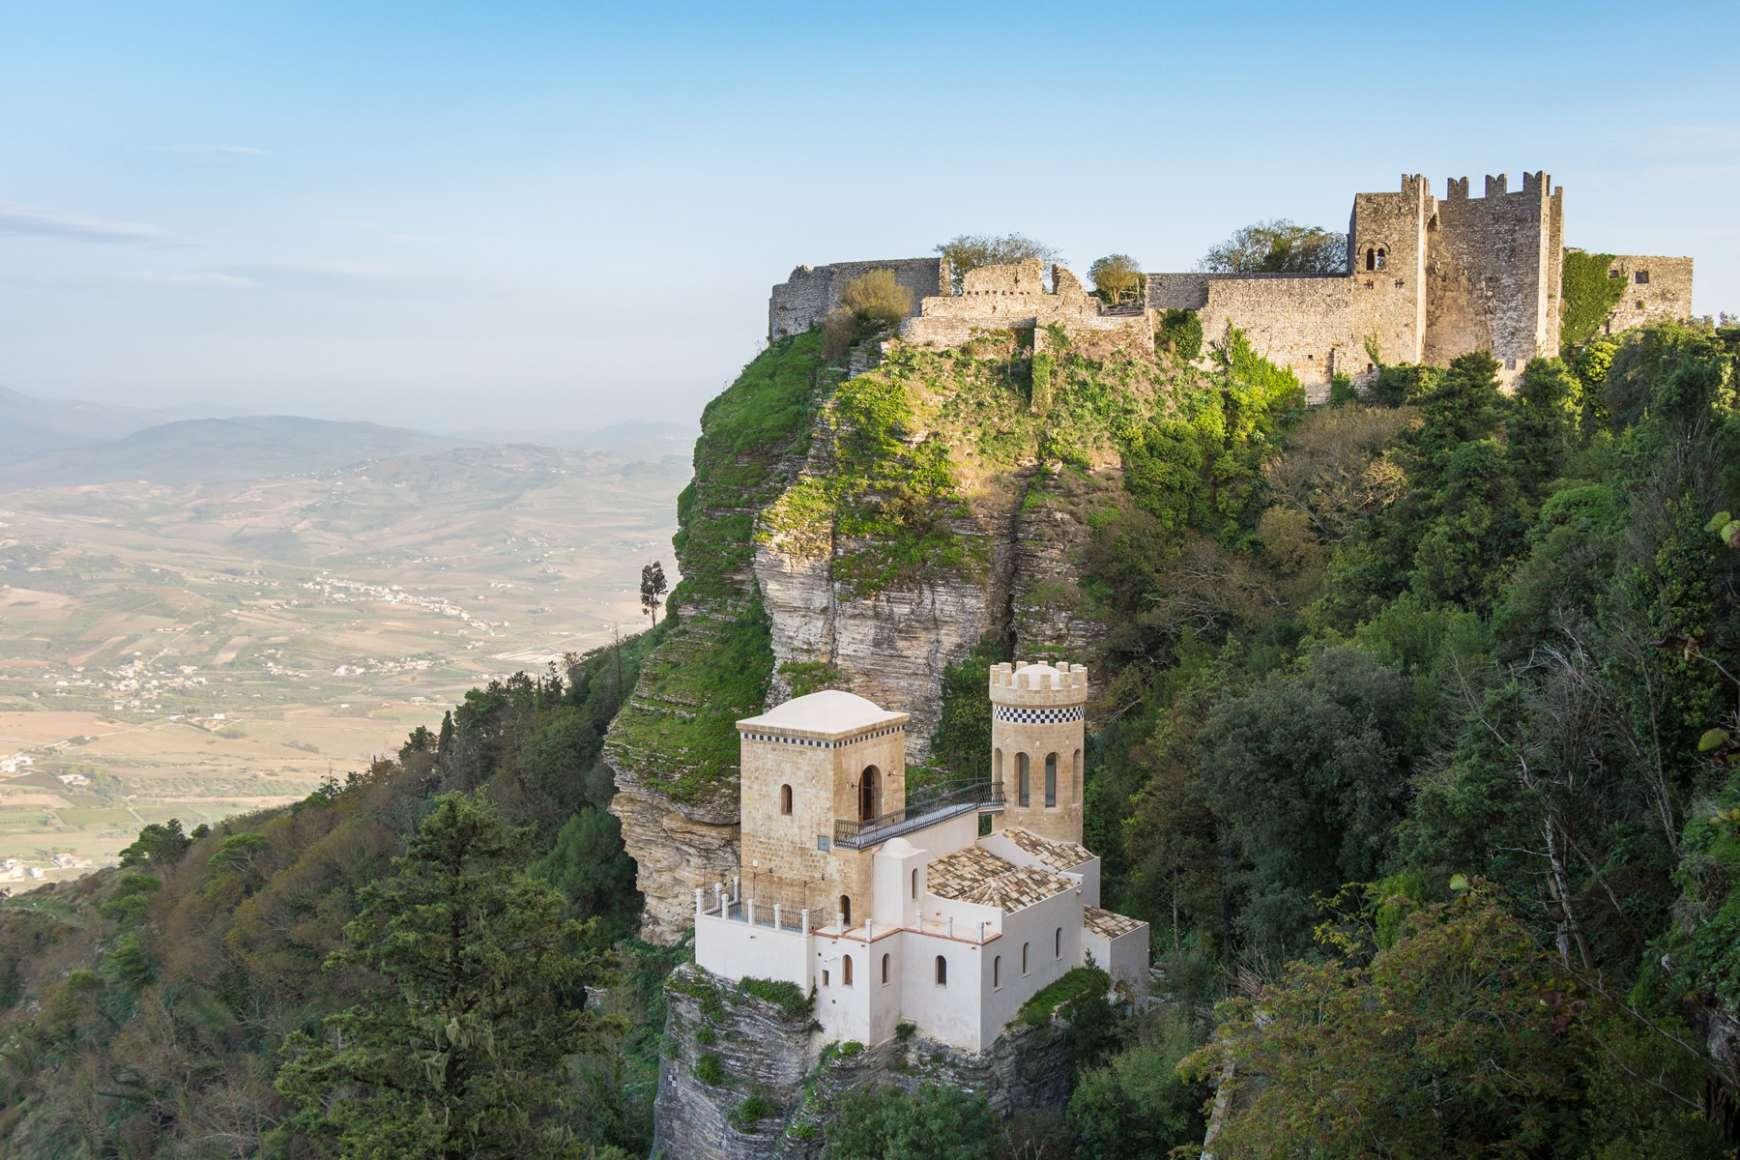 Overlooking Pepoli Castle near Trapani Italy